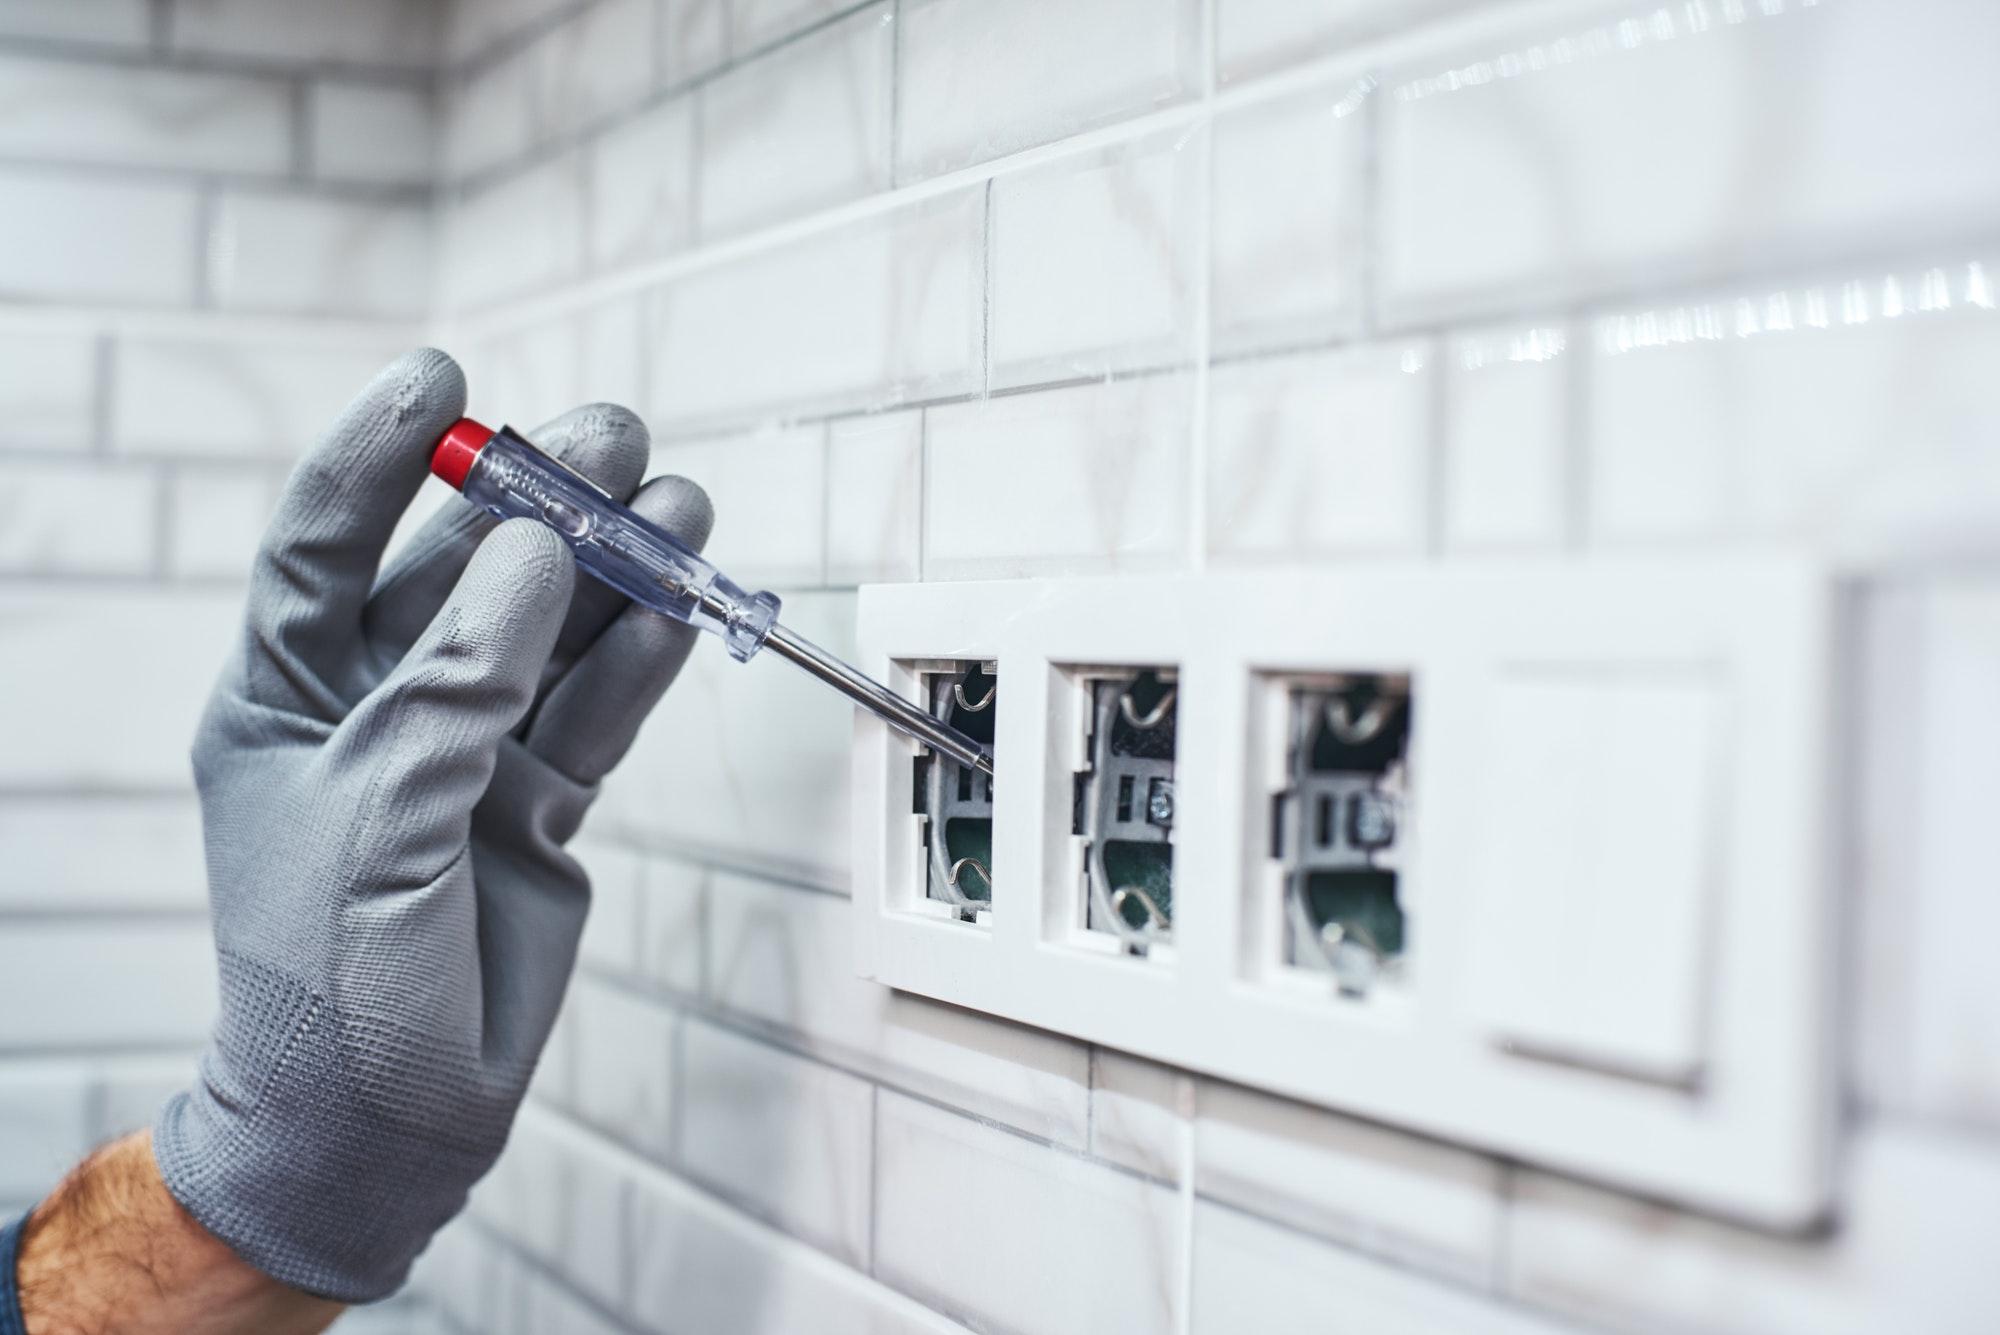 Electrical network measurement. Close-up of senior handyman setting new sockets